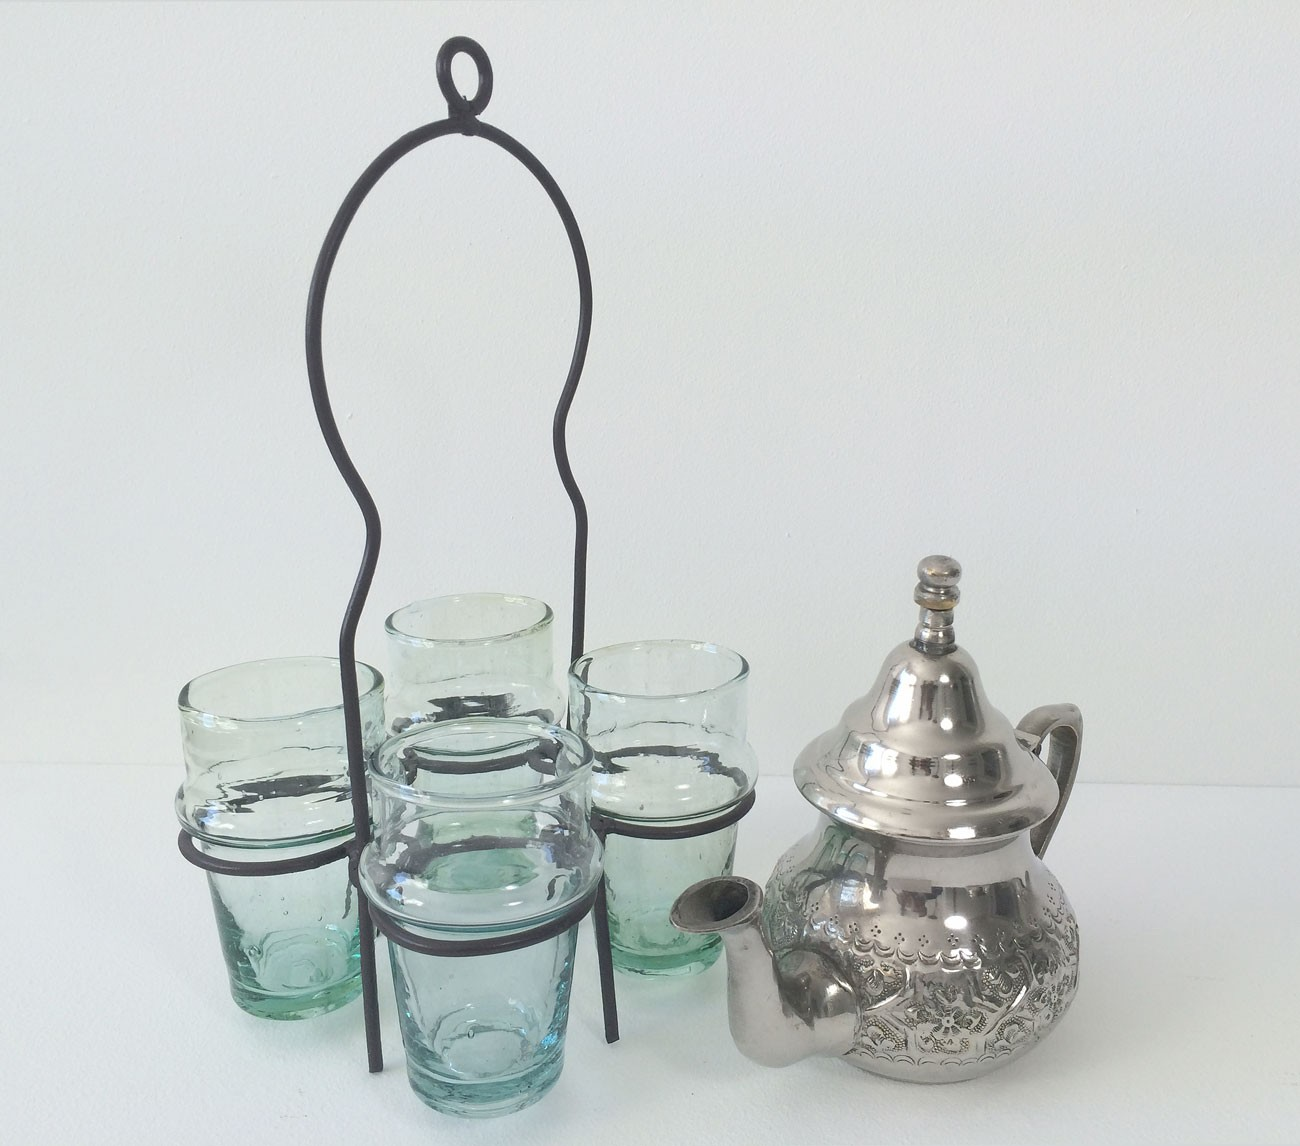 th i re marocaine sans pied avec verres et gant. Black Bedroom Furniture Sets. Home Design Ideas